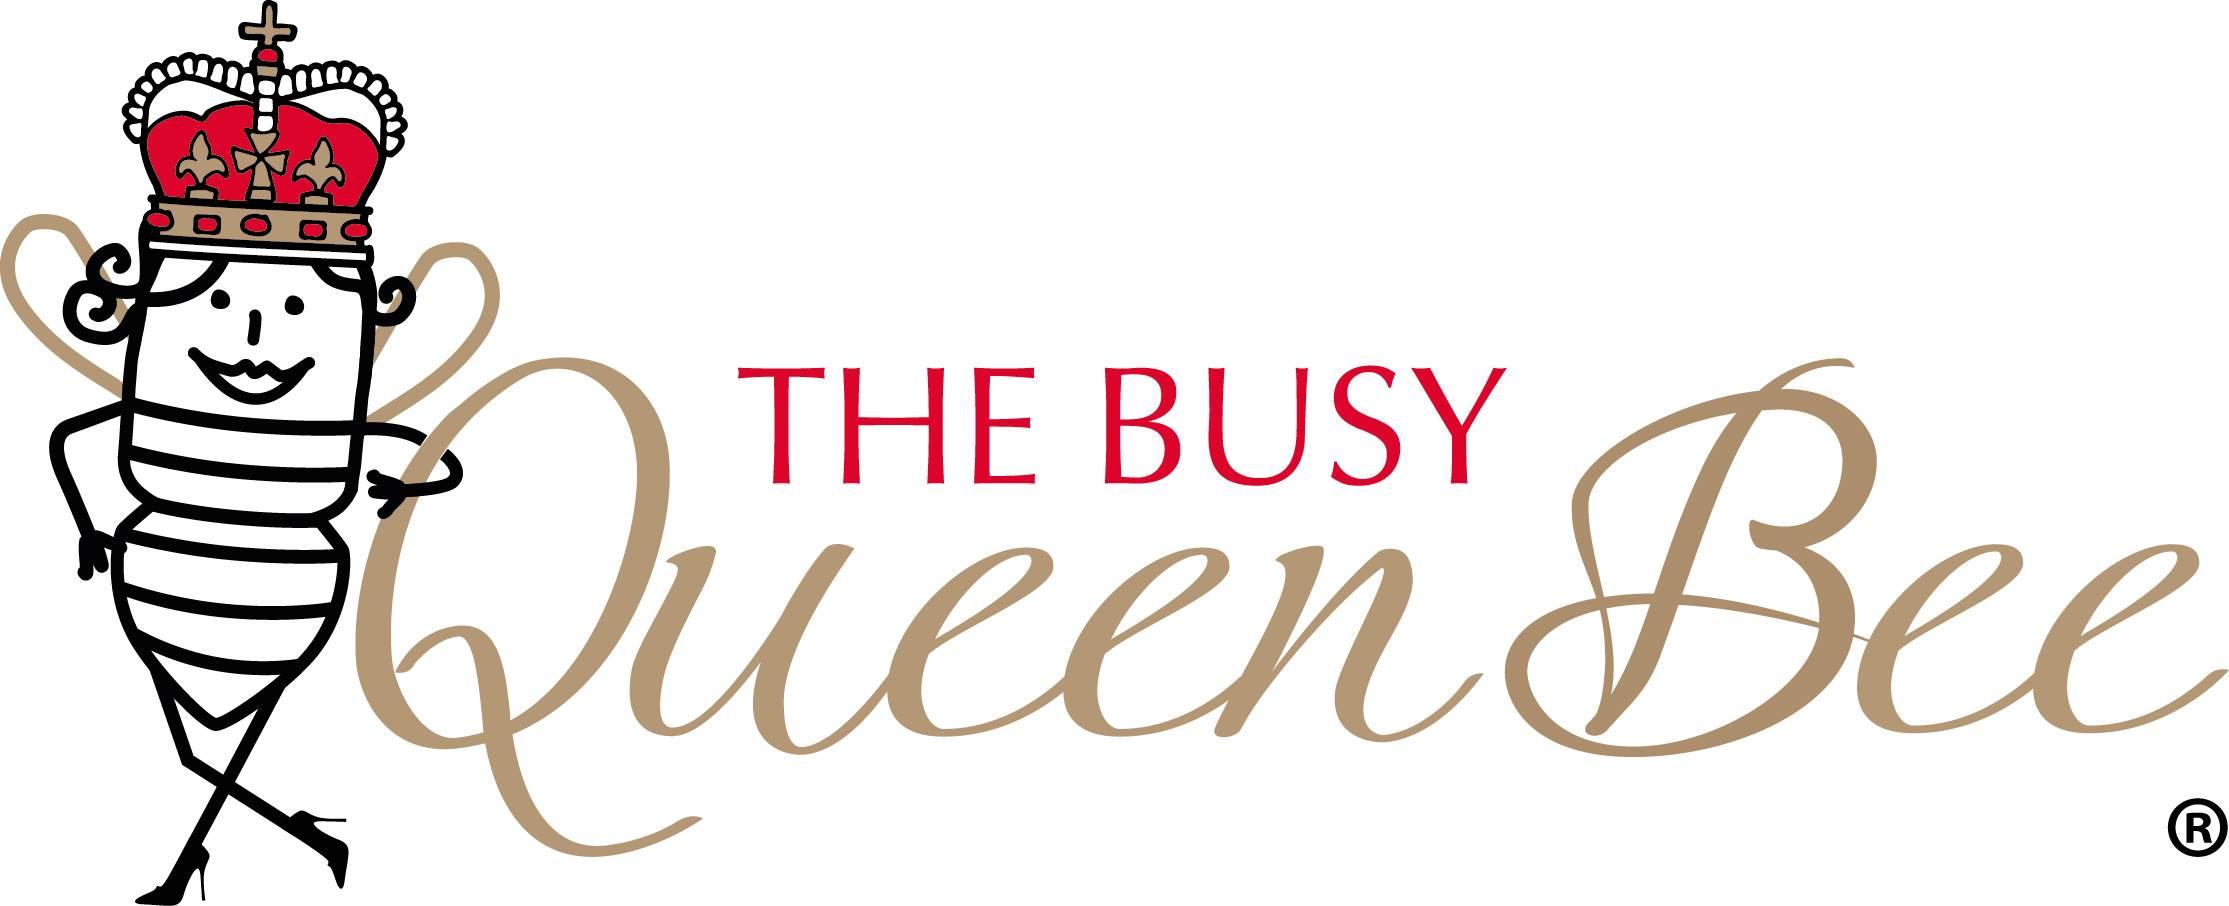 The Busy Queen Bee logo